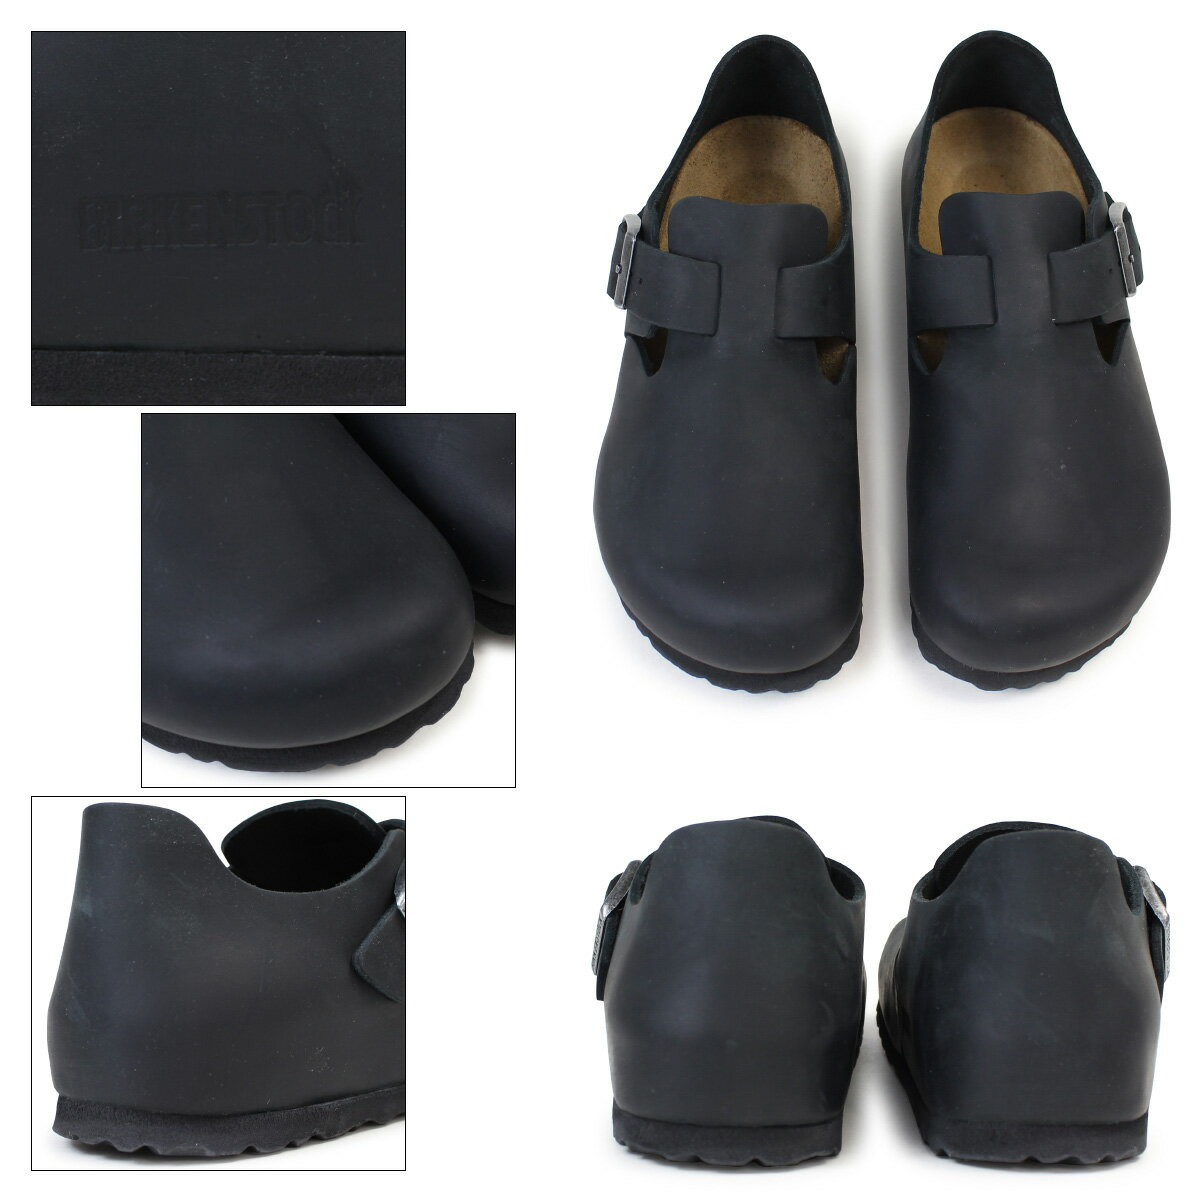 e98d686a09912 ... Birkenstock shoes for men ladies Sandals room LONDON 3 color, BIRKENSTOCK  London ...